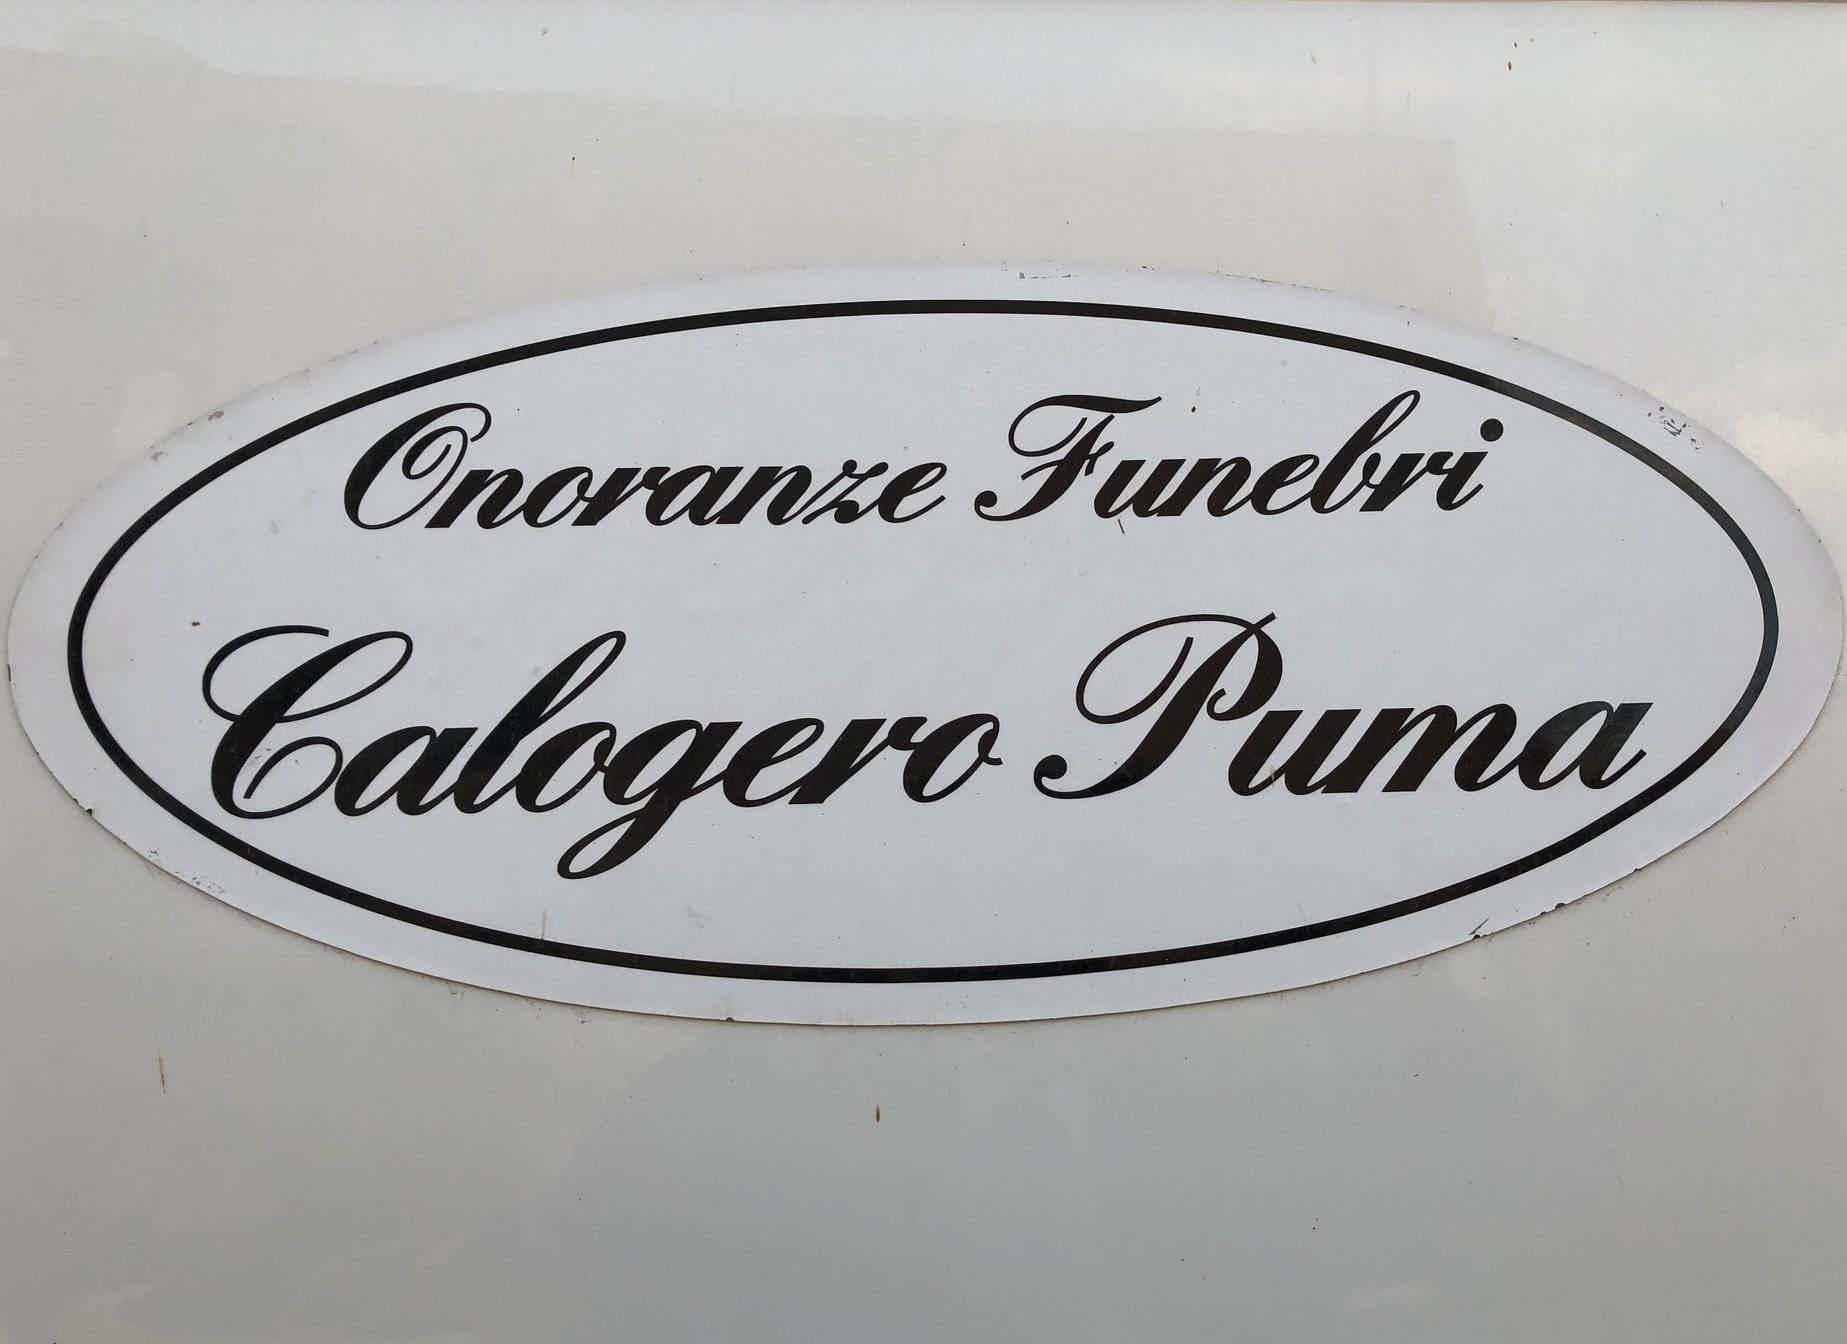 Onoranze Funebri Calogero Puma